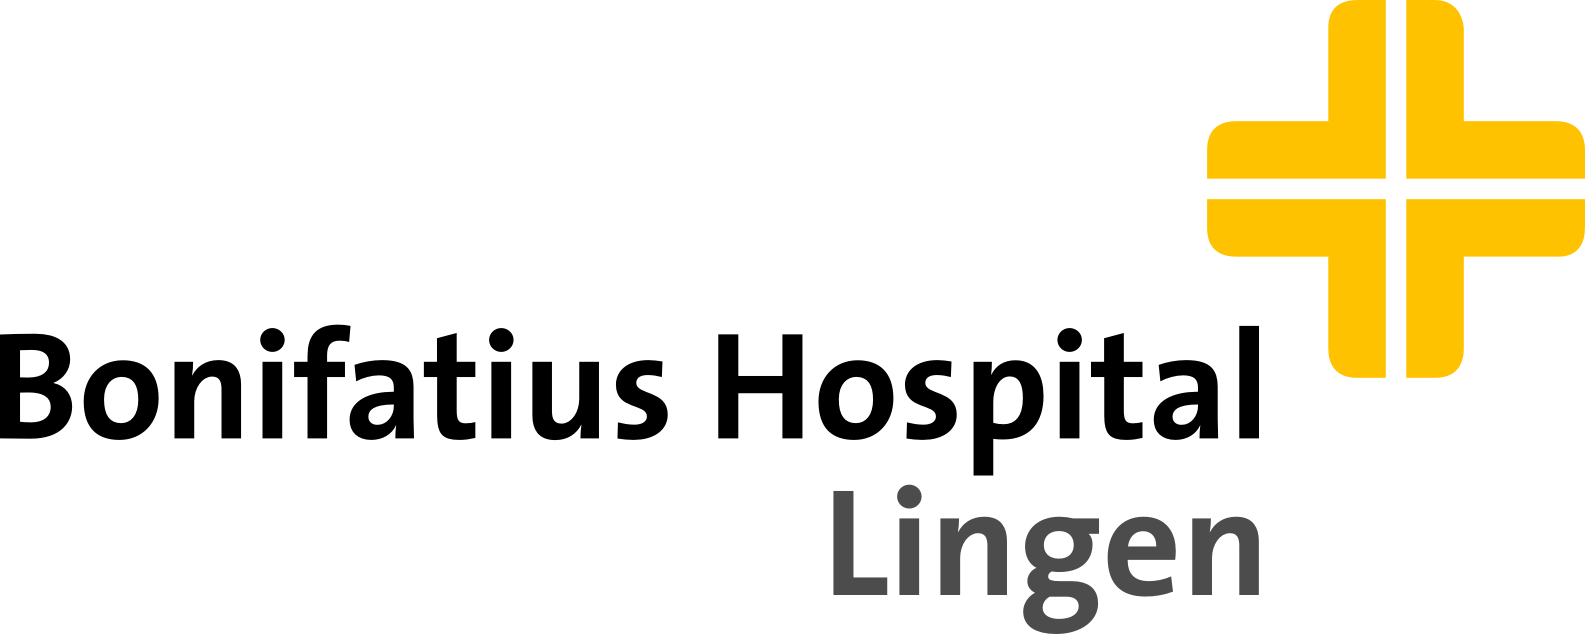 Bonifatius Hospital Lingen gGmbH